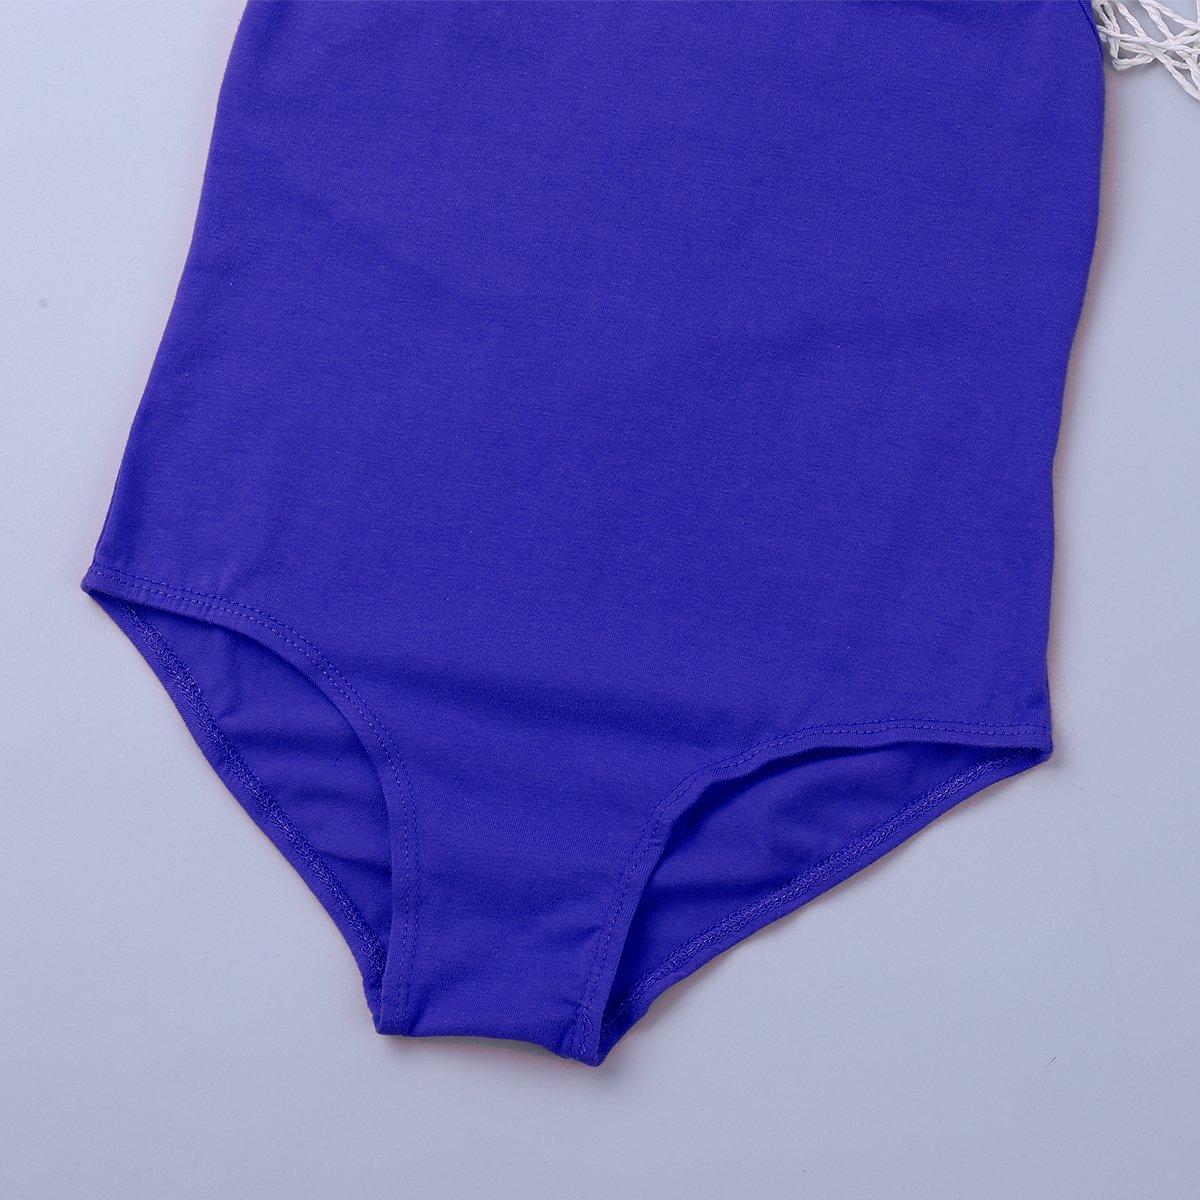 CHICTRY Big Girls Ballet Dancewear Leotard Gymnastics Sleeveless Turtleneck Bodysuit with Lace O-Back